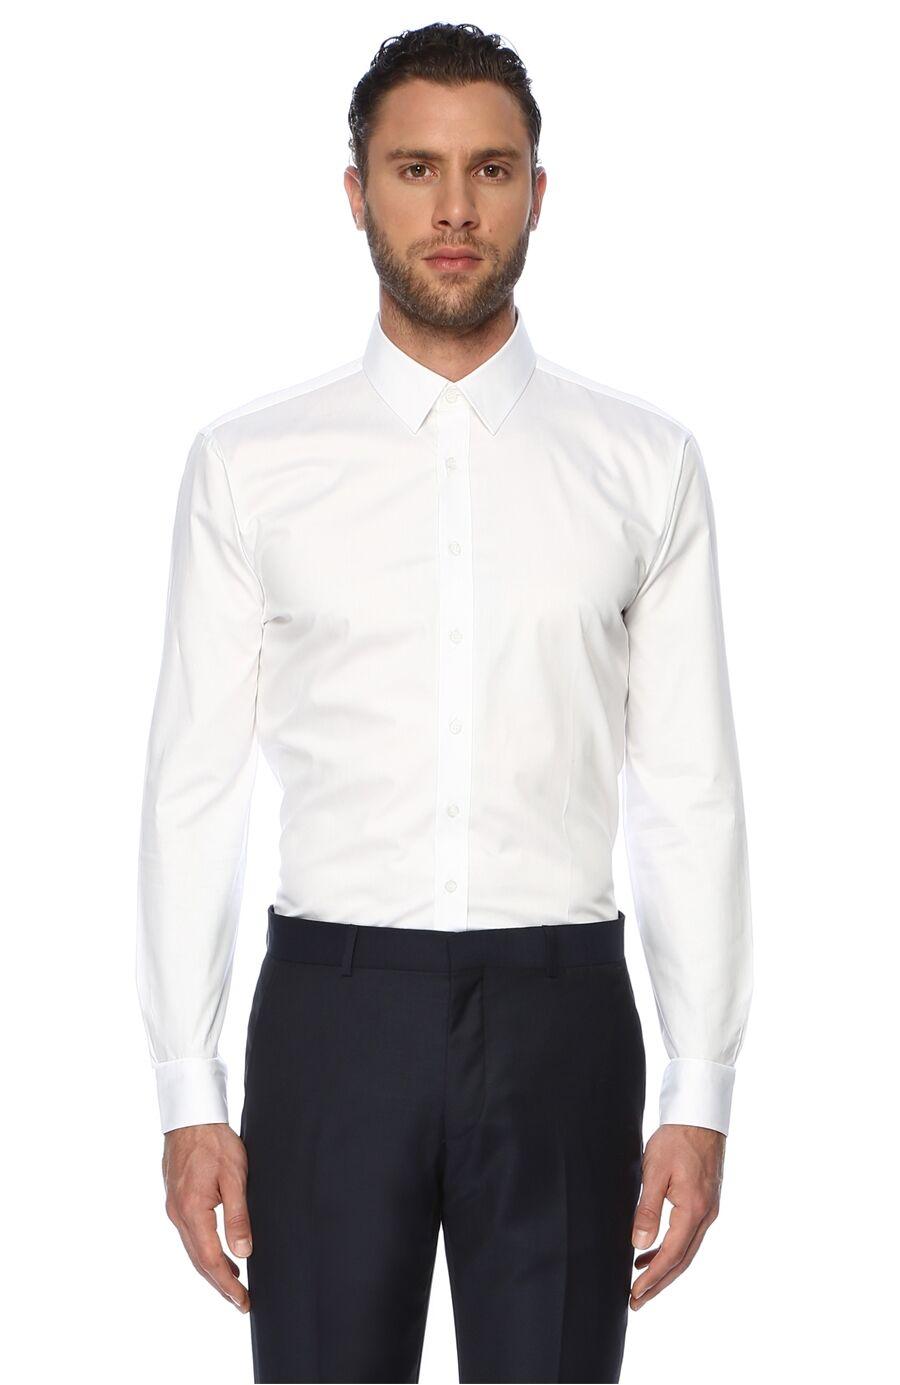 Network Slim Fit Beyaz Gömlek – 179.5 TL